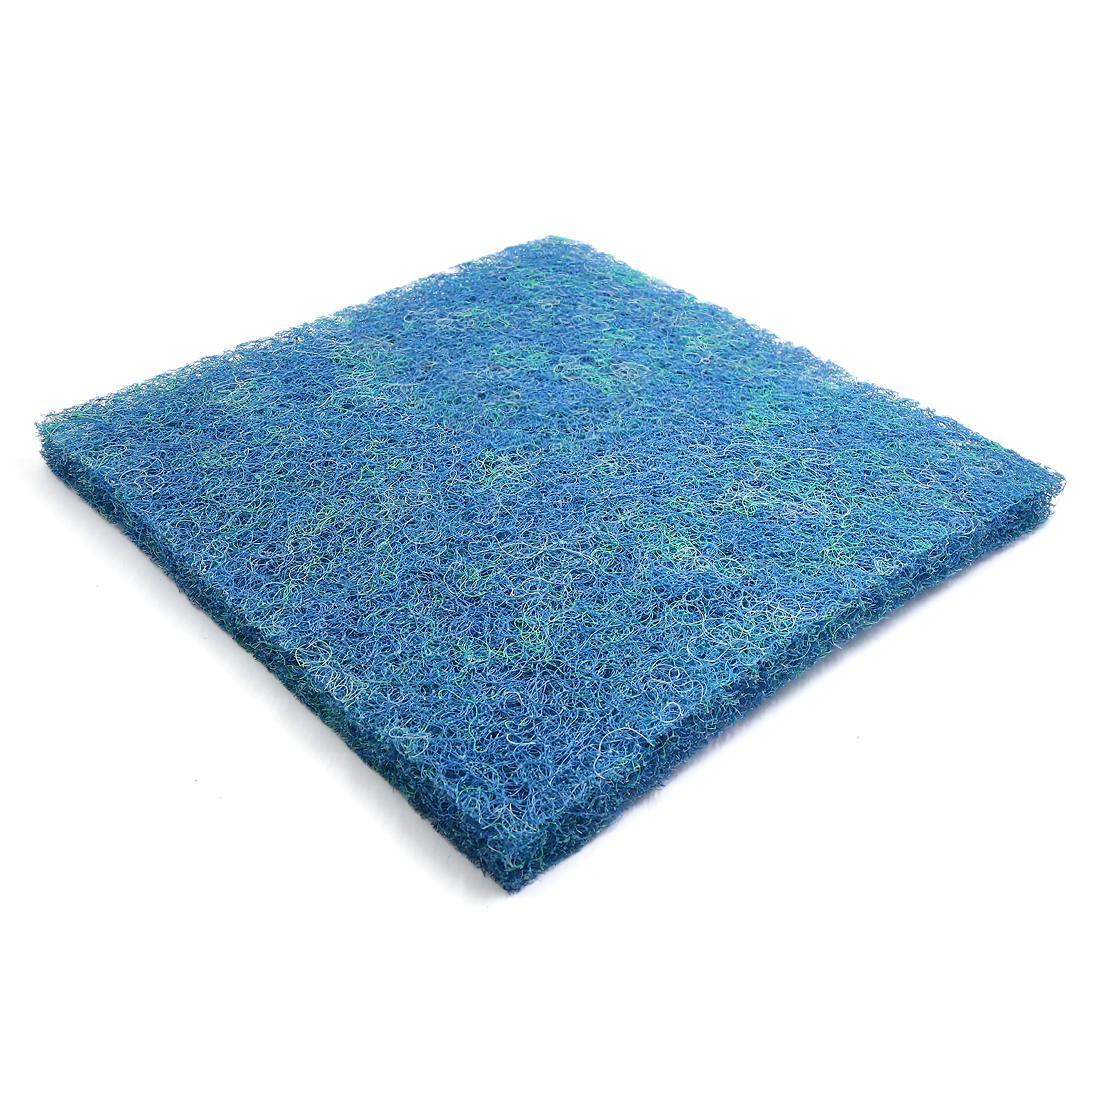 "Blue Bio Chemical Mat Pre-Filter Sponge Pad for Aquarium Kio Pond 19.7""x19.7"""